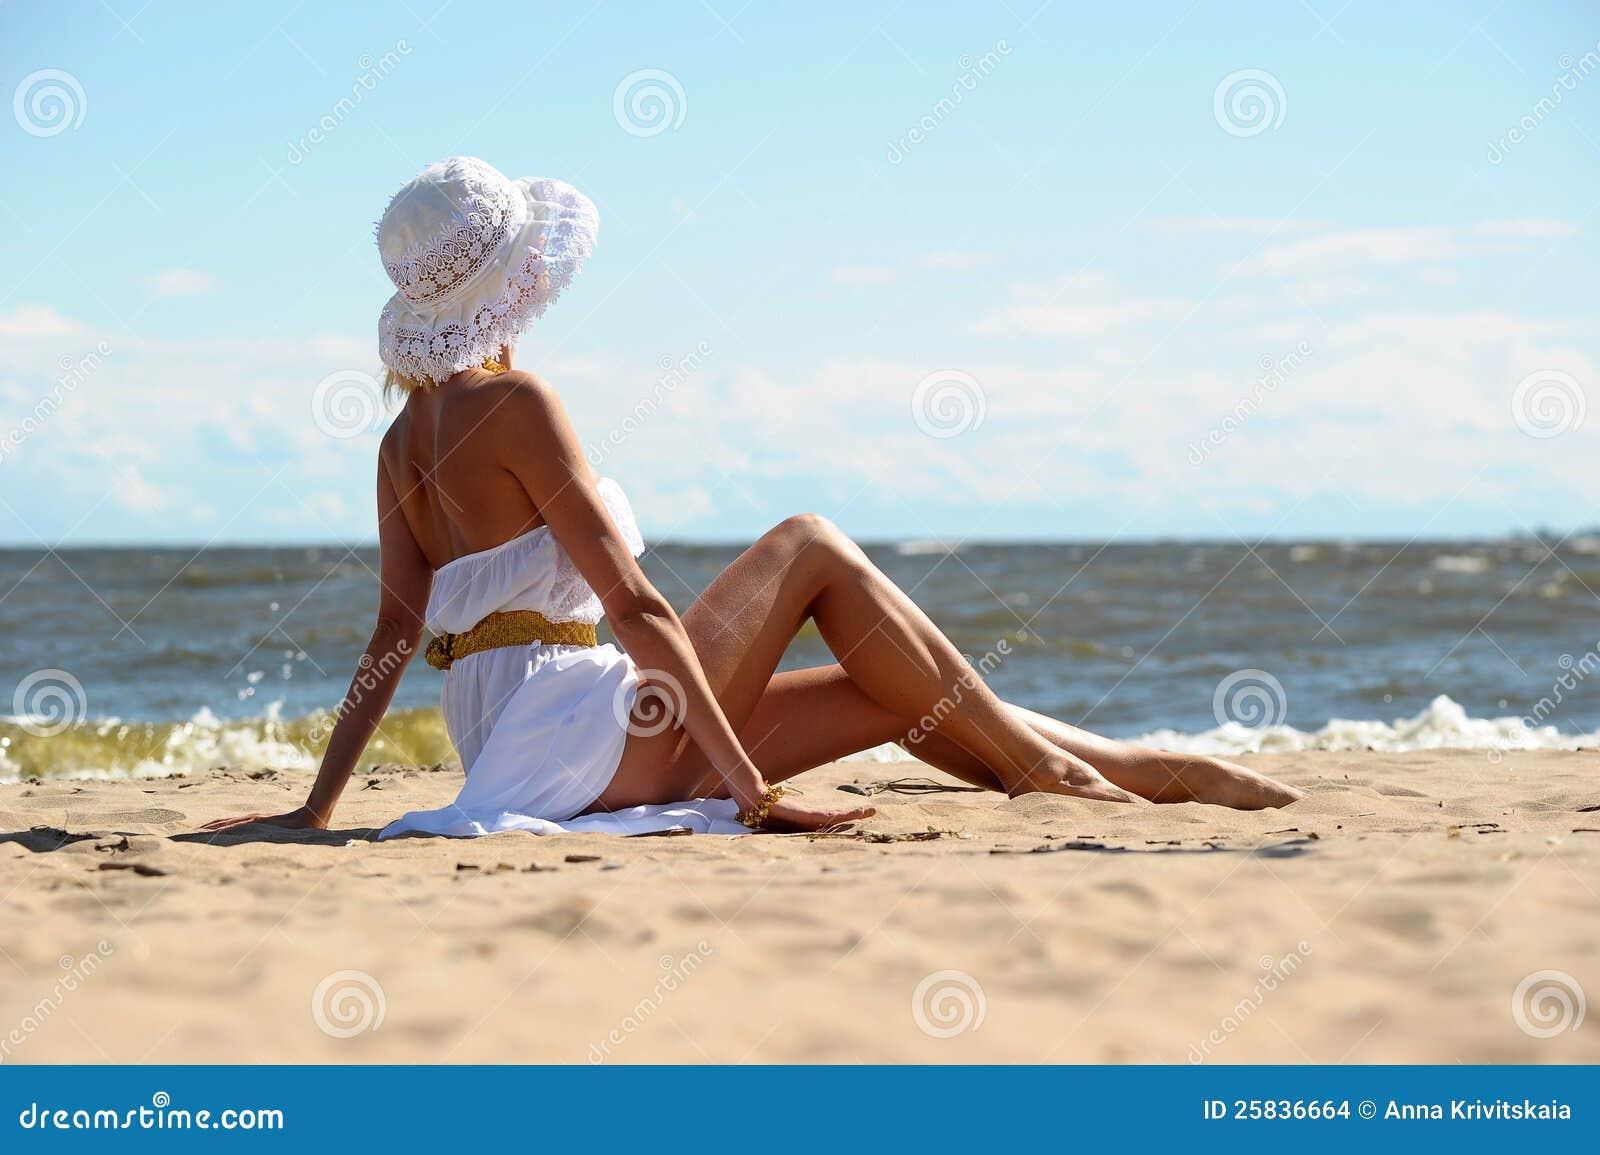 The girl on the beach stock photo. Image of female 4cf8e7494b